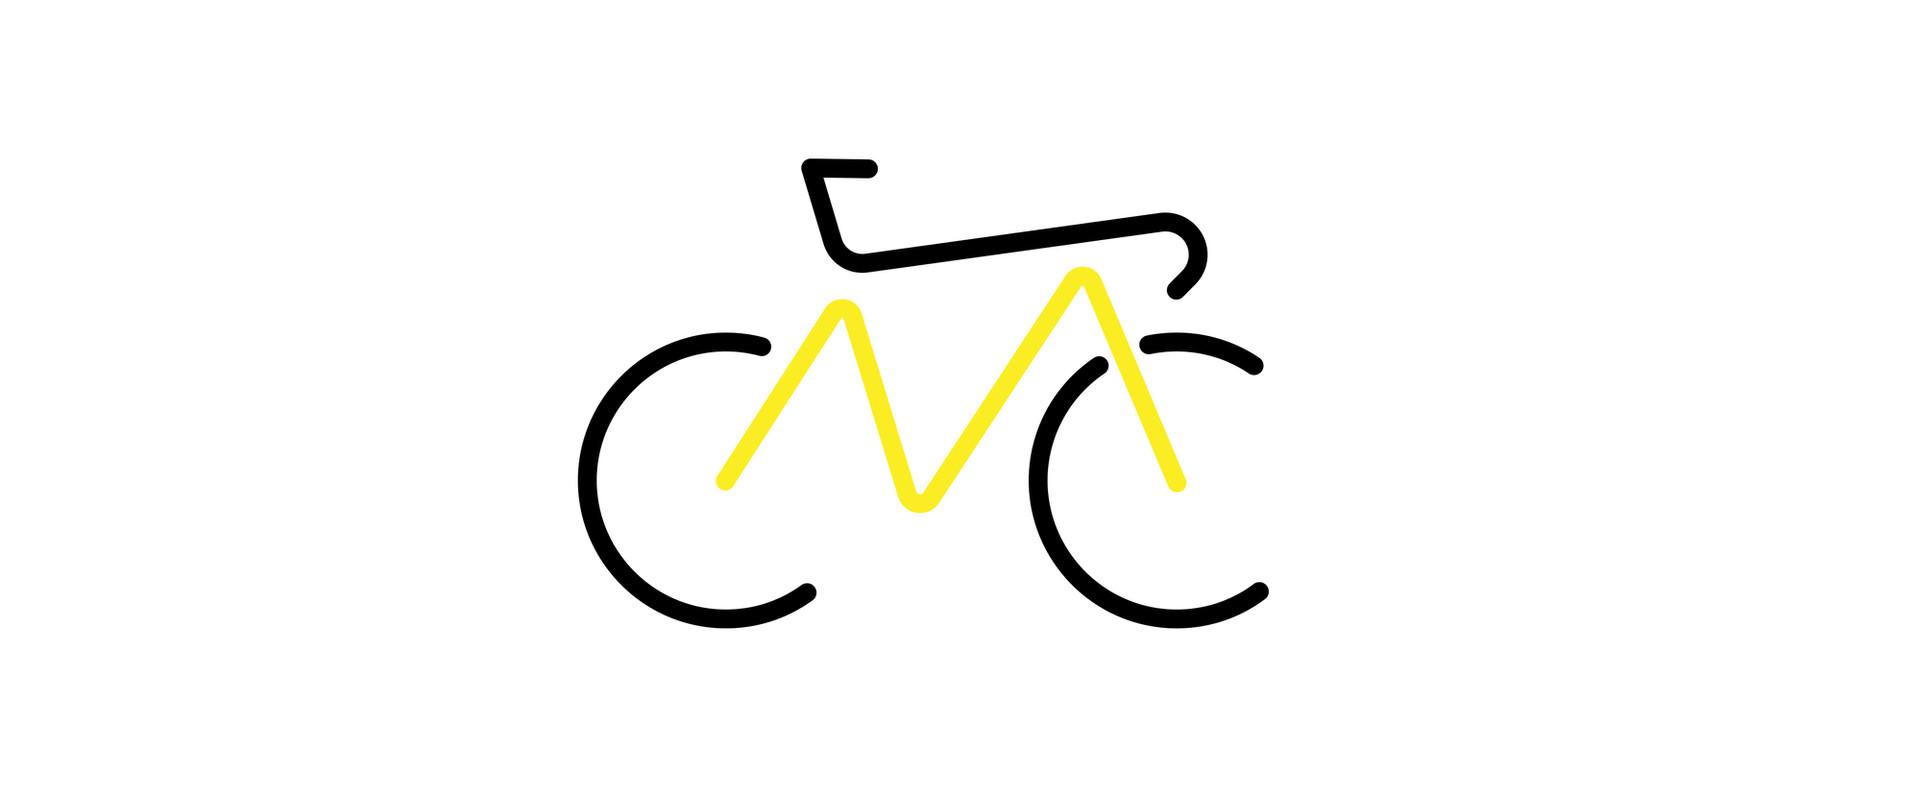 Investment bank logo idea